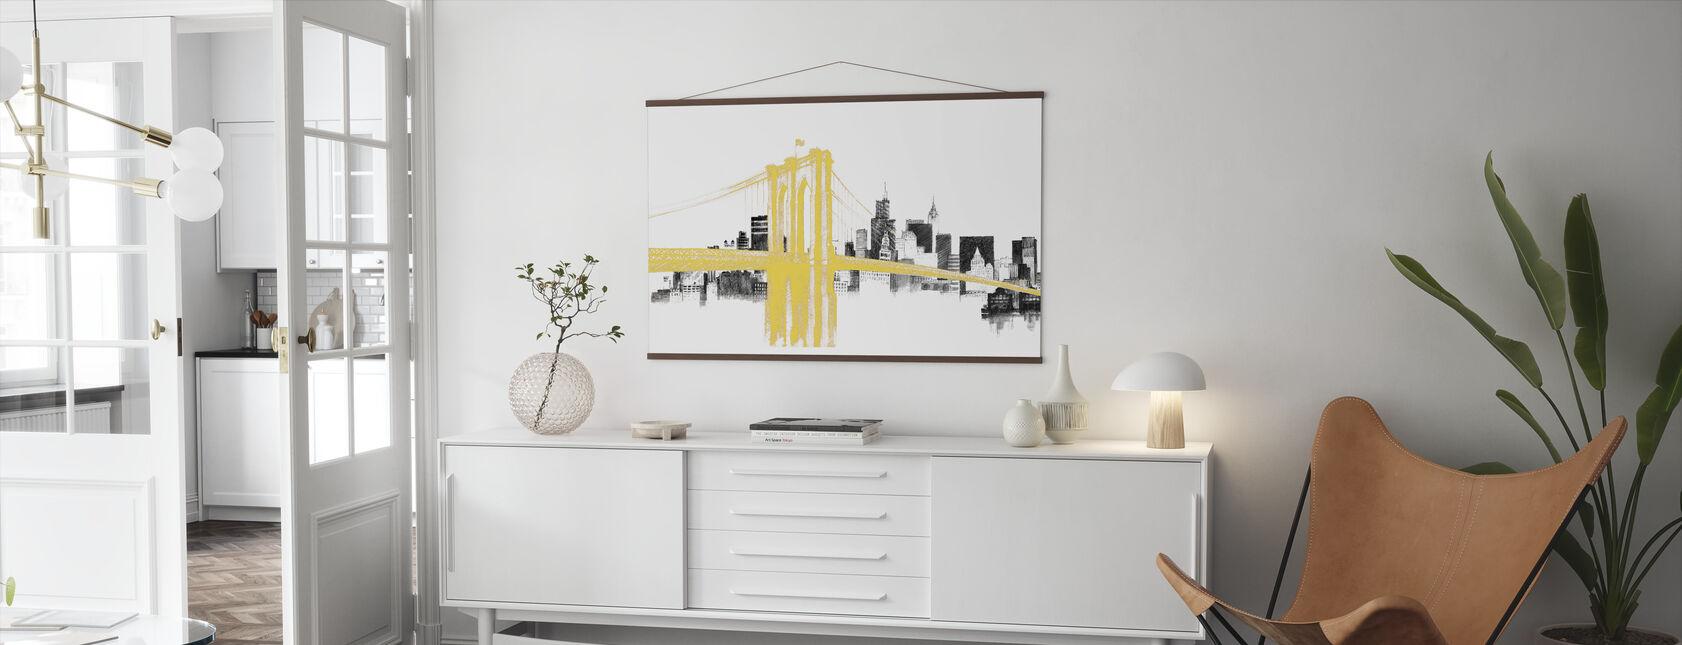 Skyline Crossing Yellow - Poster - Living Room